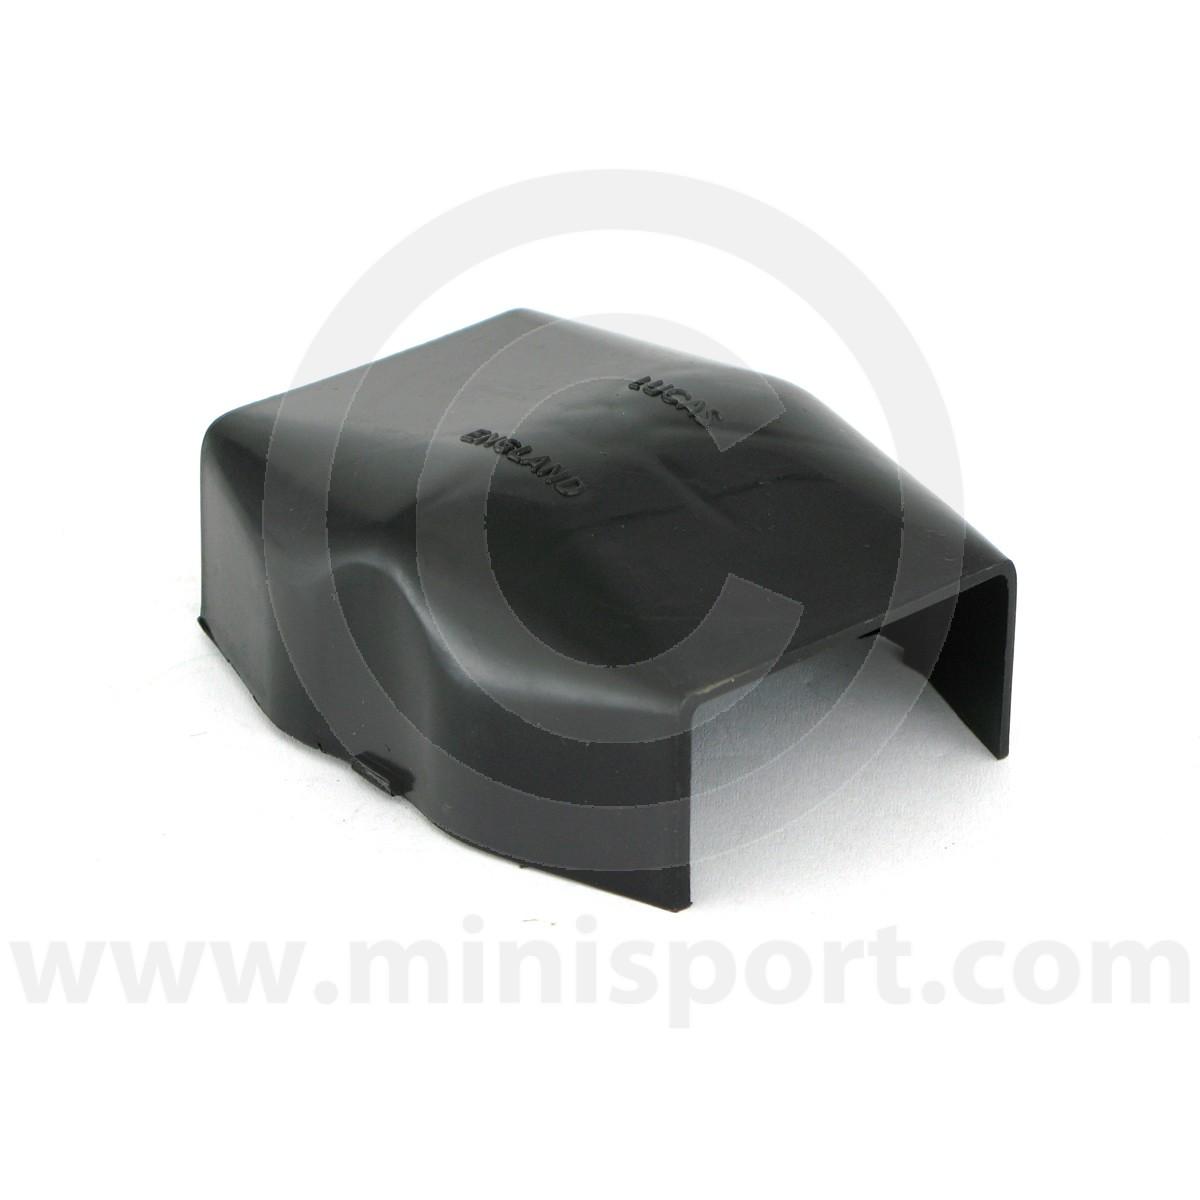 505158a Mini Fuse Box Cover Electrical More Views